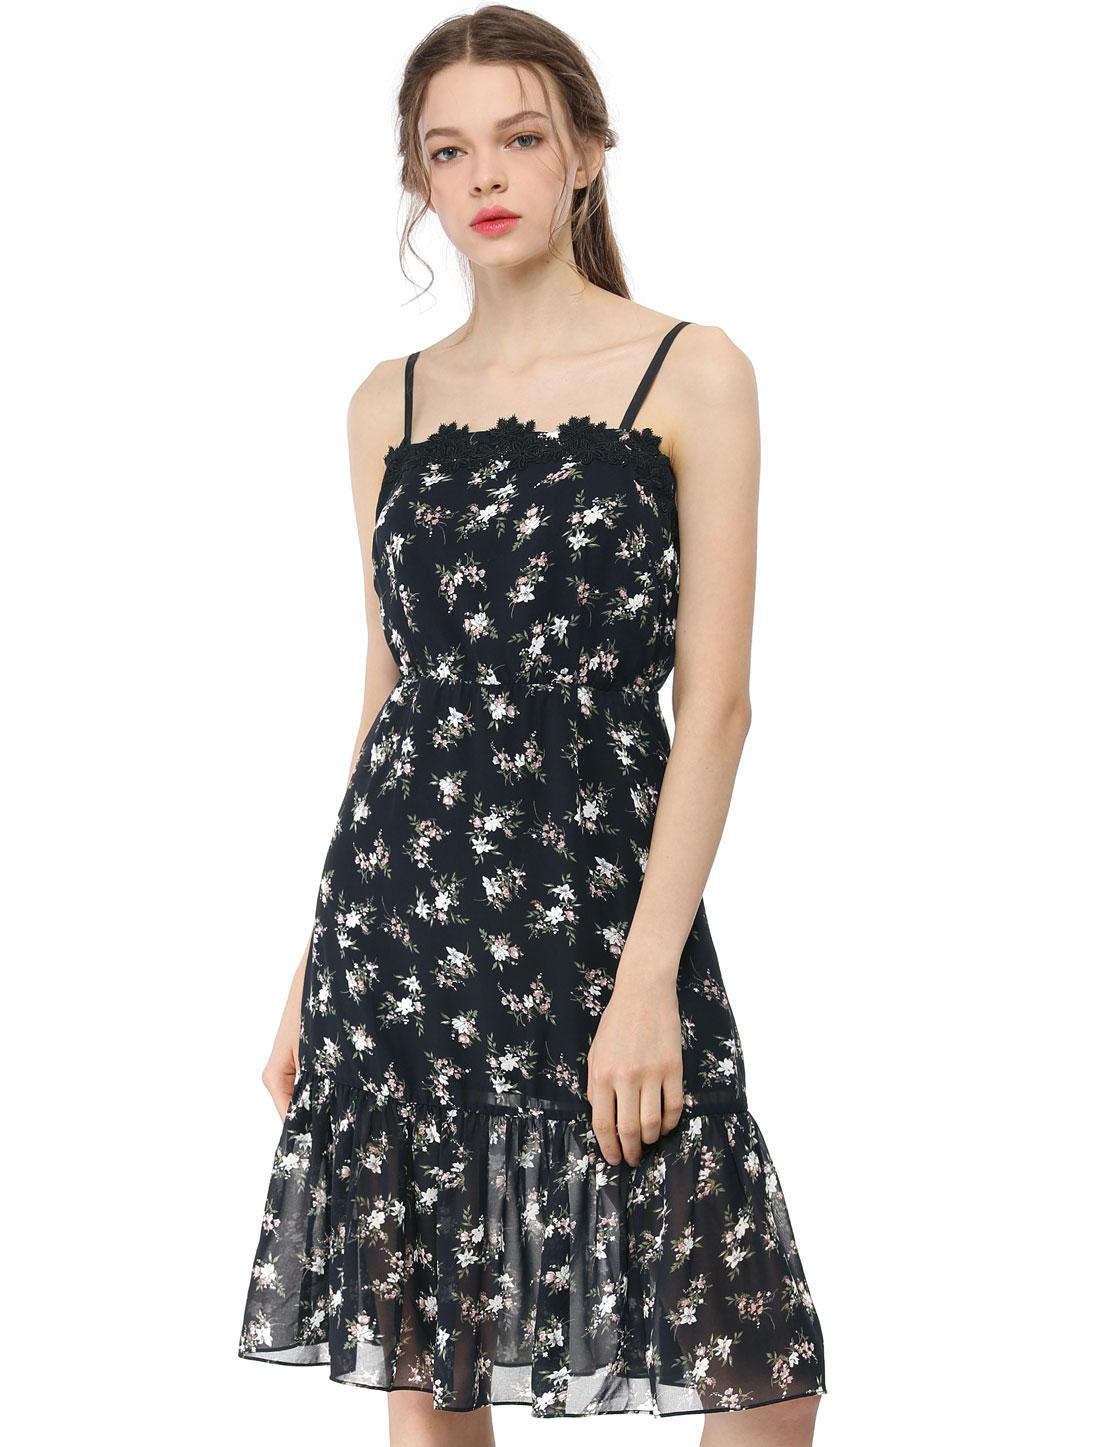 Allegra K Women's Chiffon Spaghetti Strap Midi Floral Dress Black M